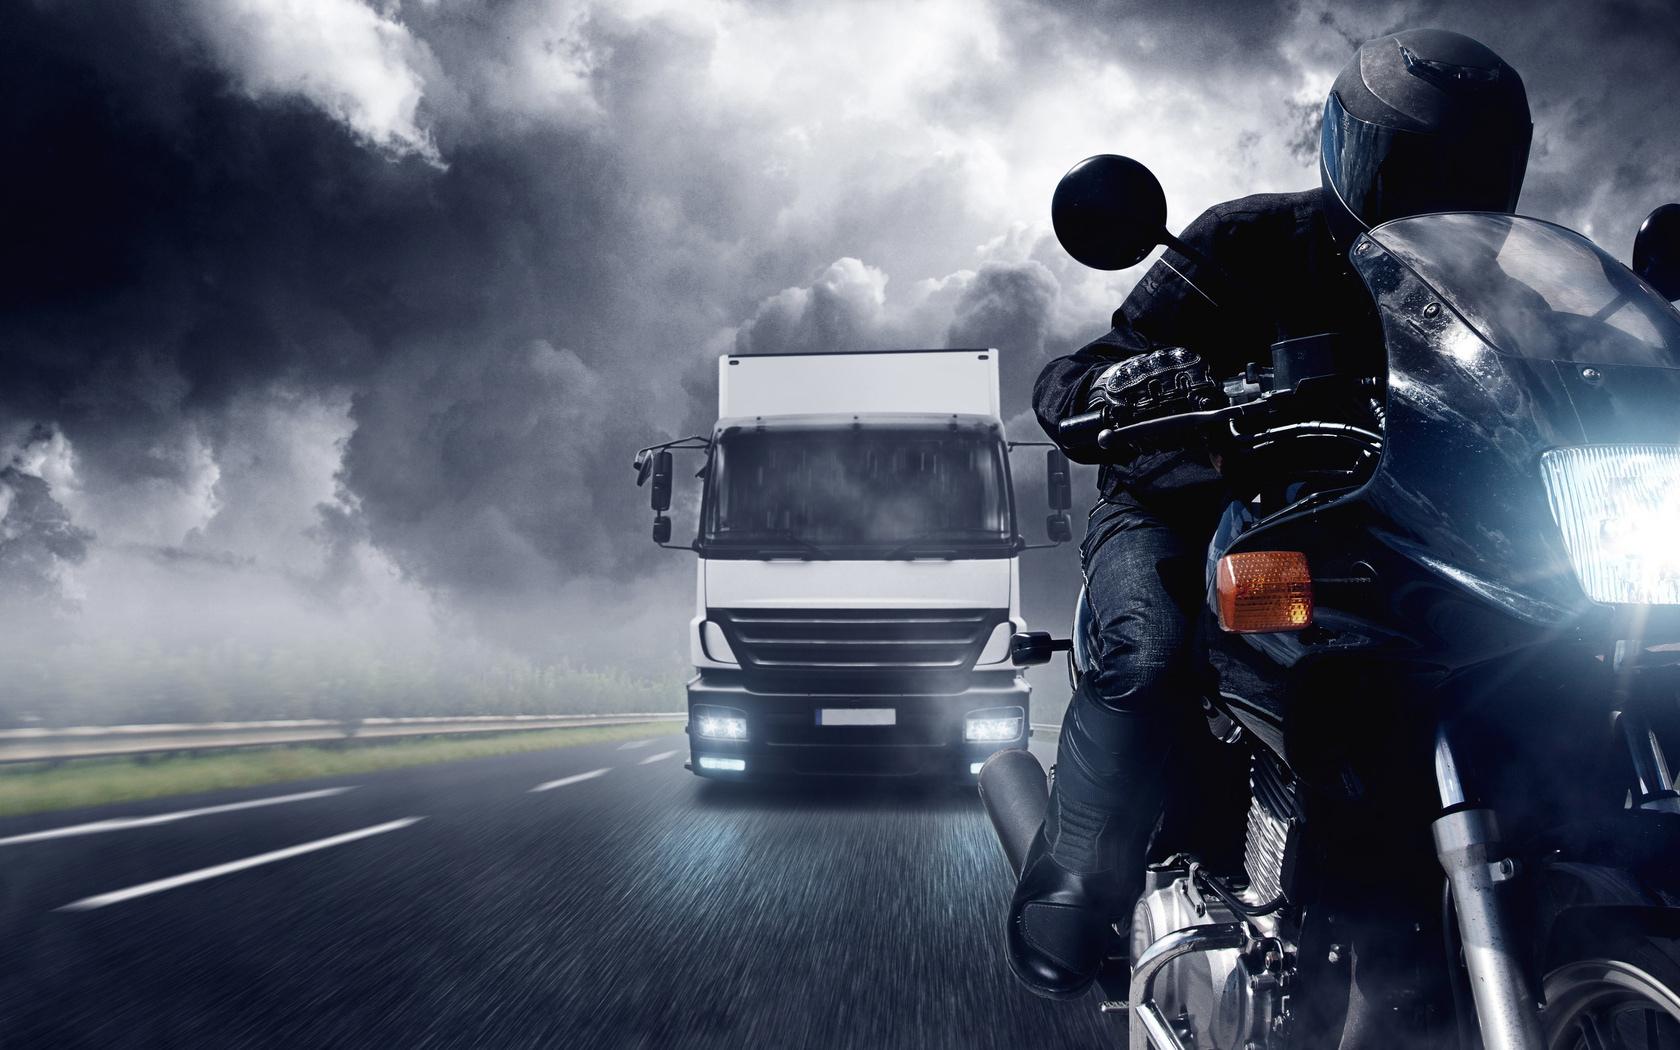 motorcu adam